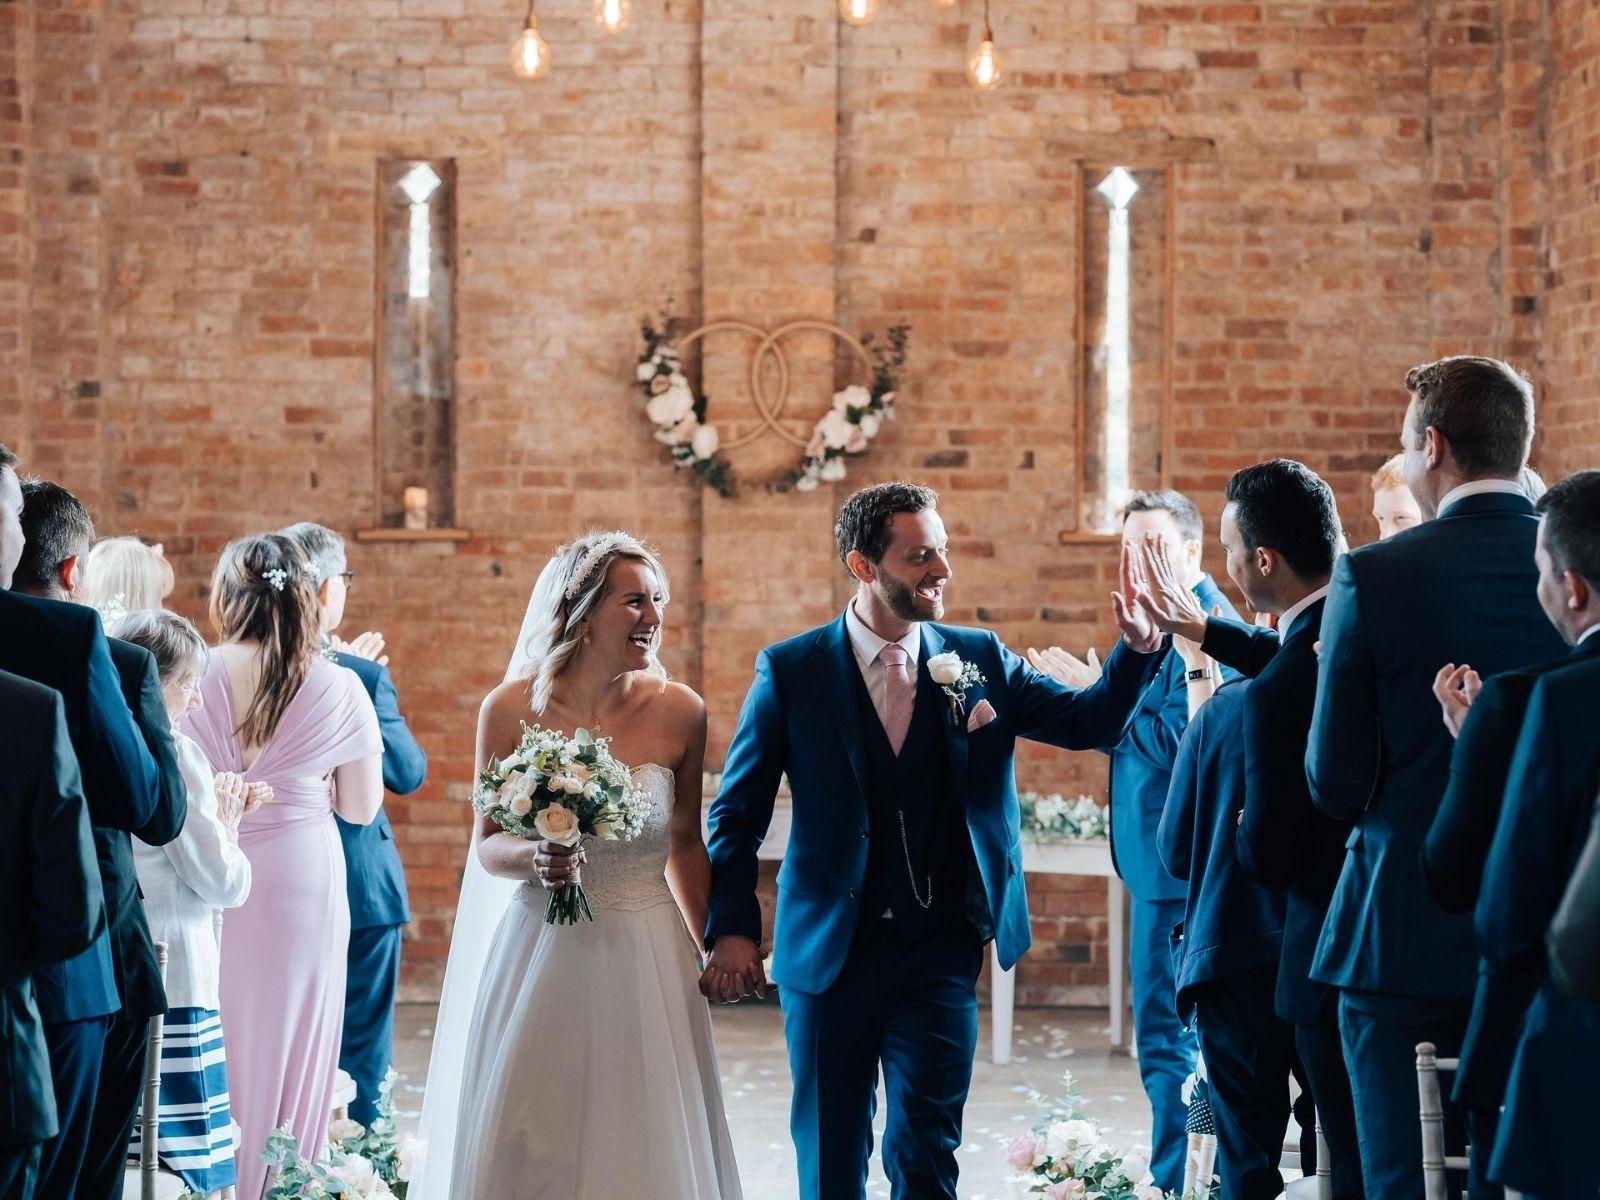 Bride holding wedding flowers leaving barn wedding ceremony